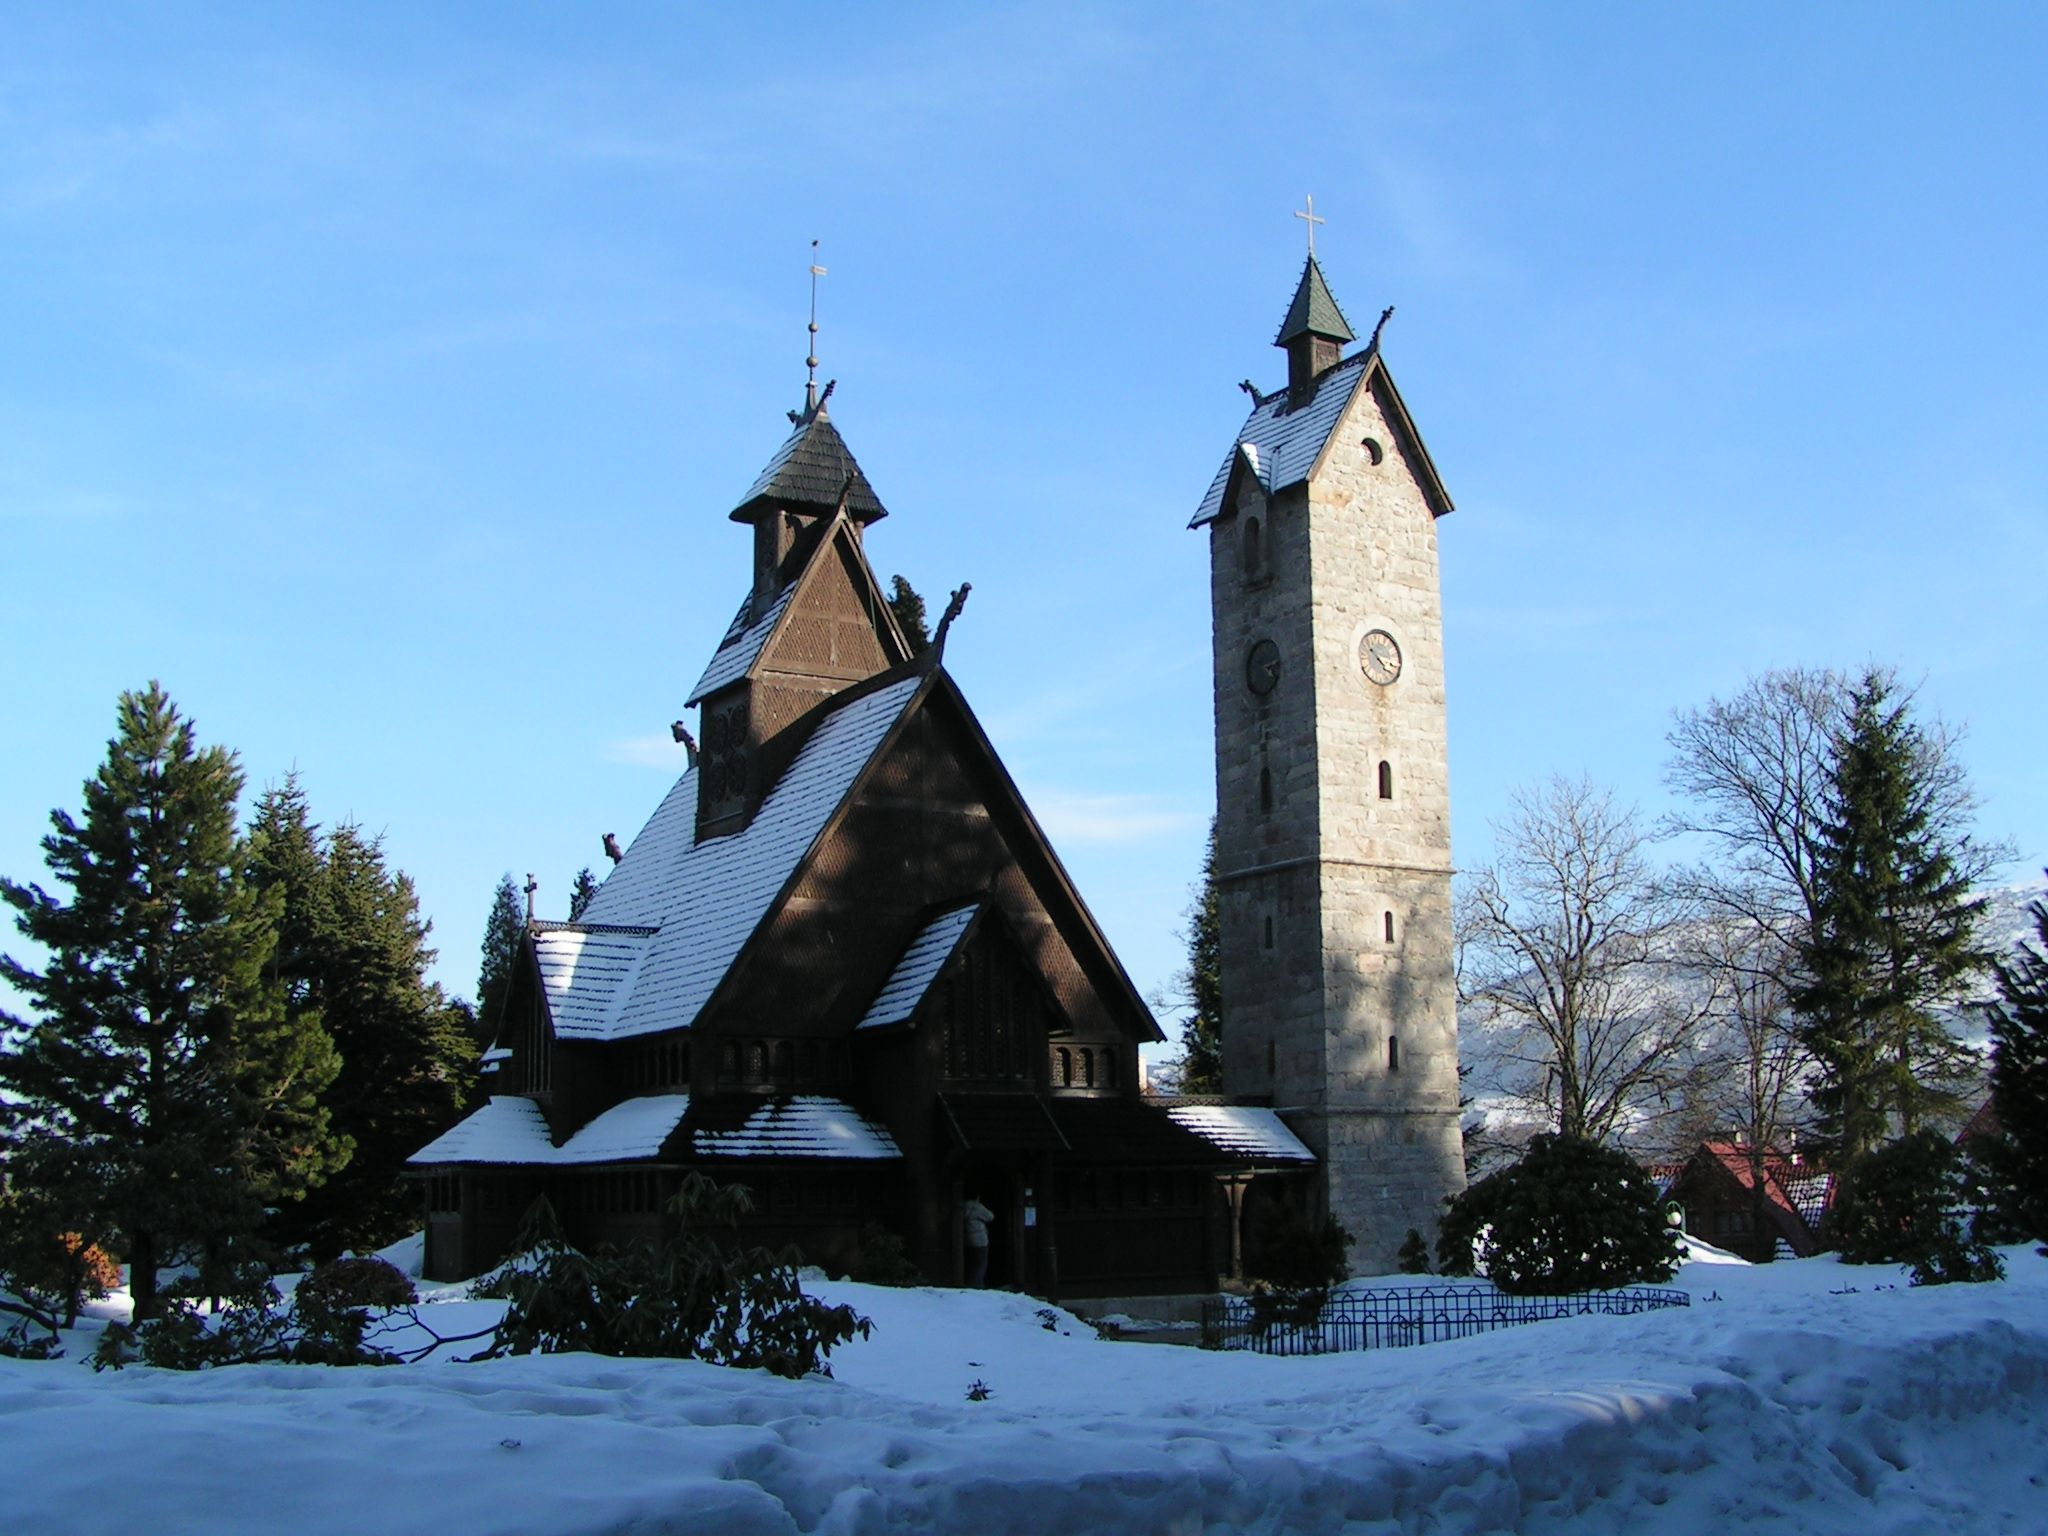 Polands Most Beautiful Churches